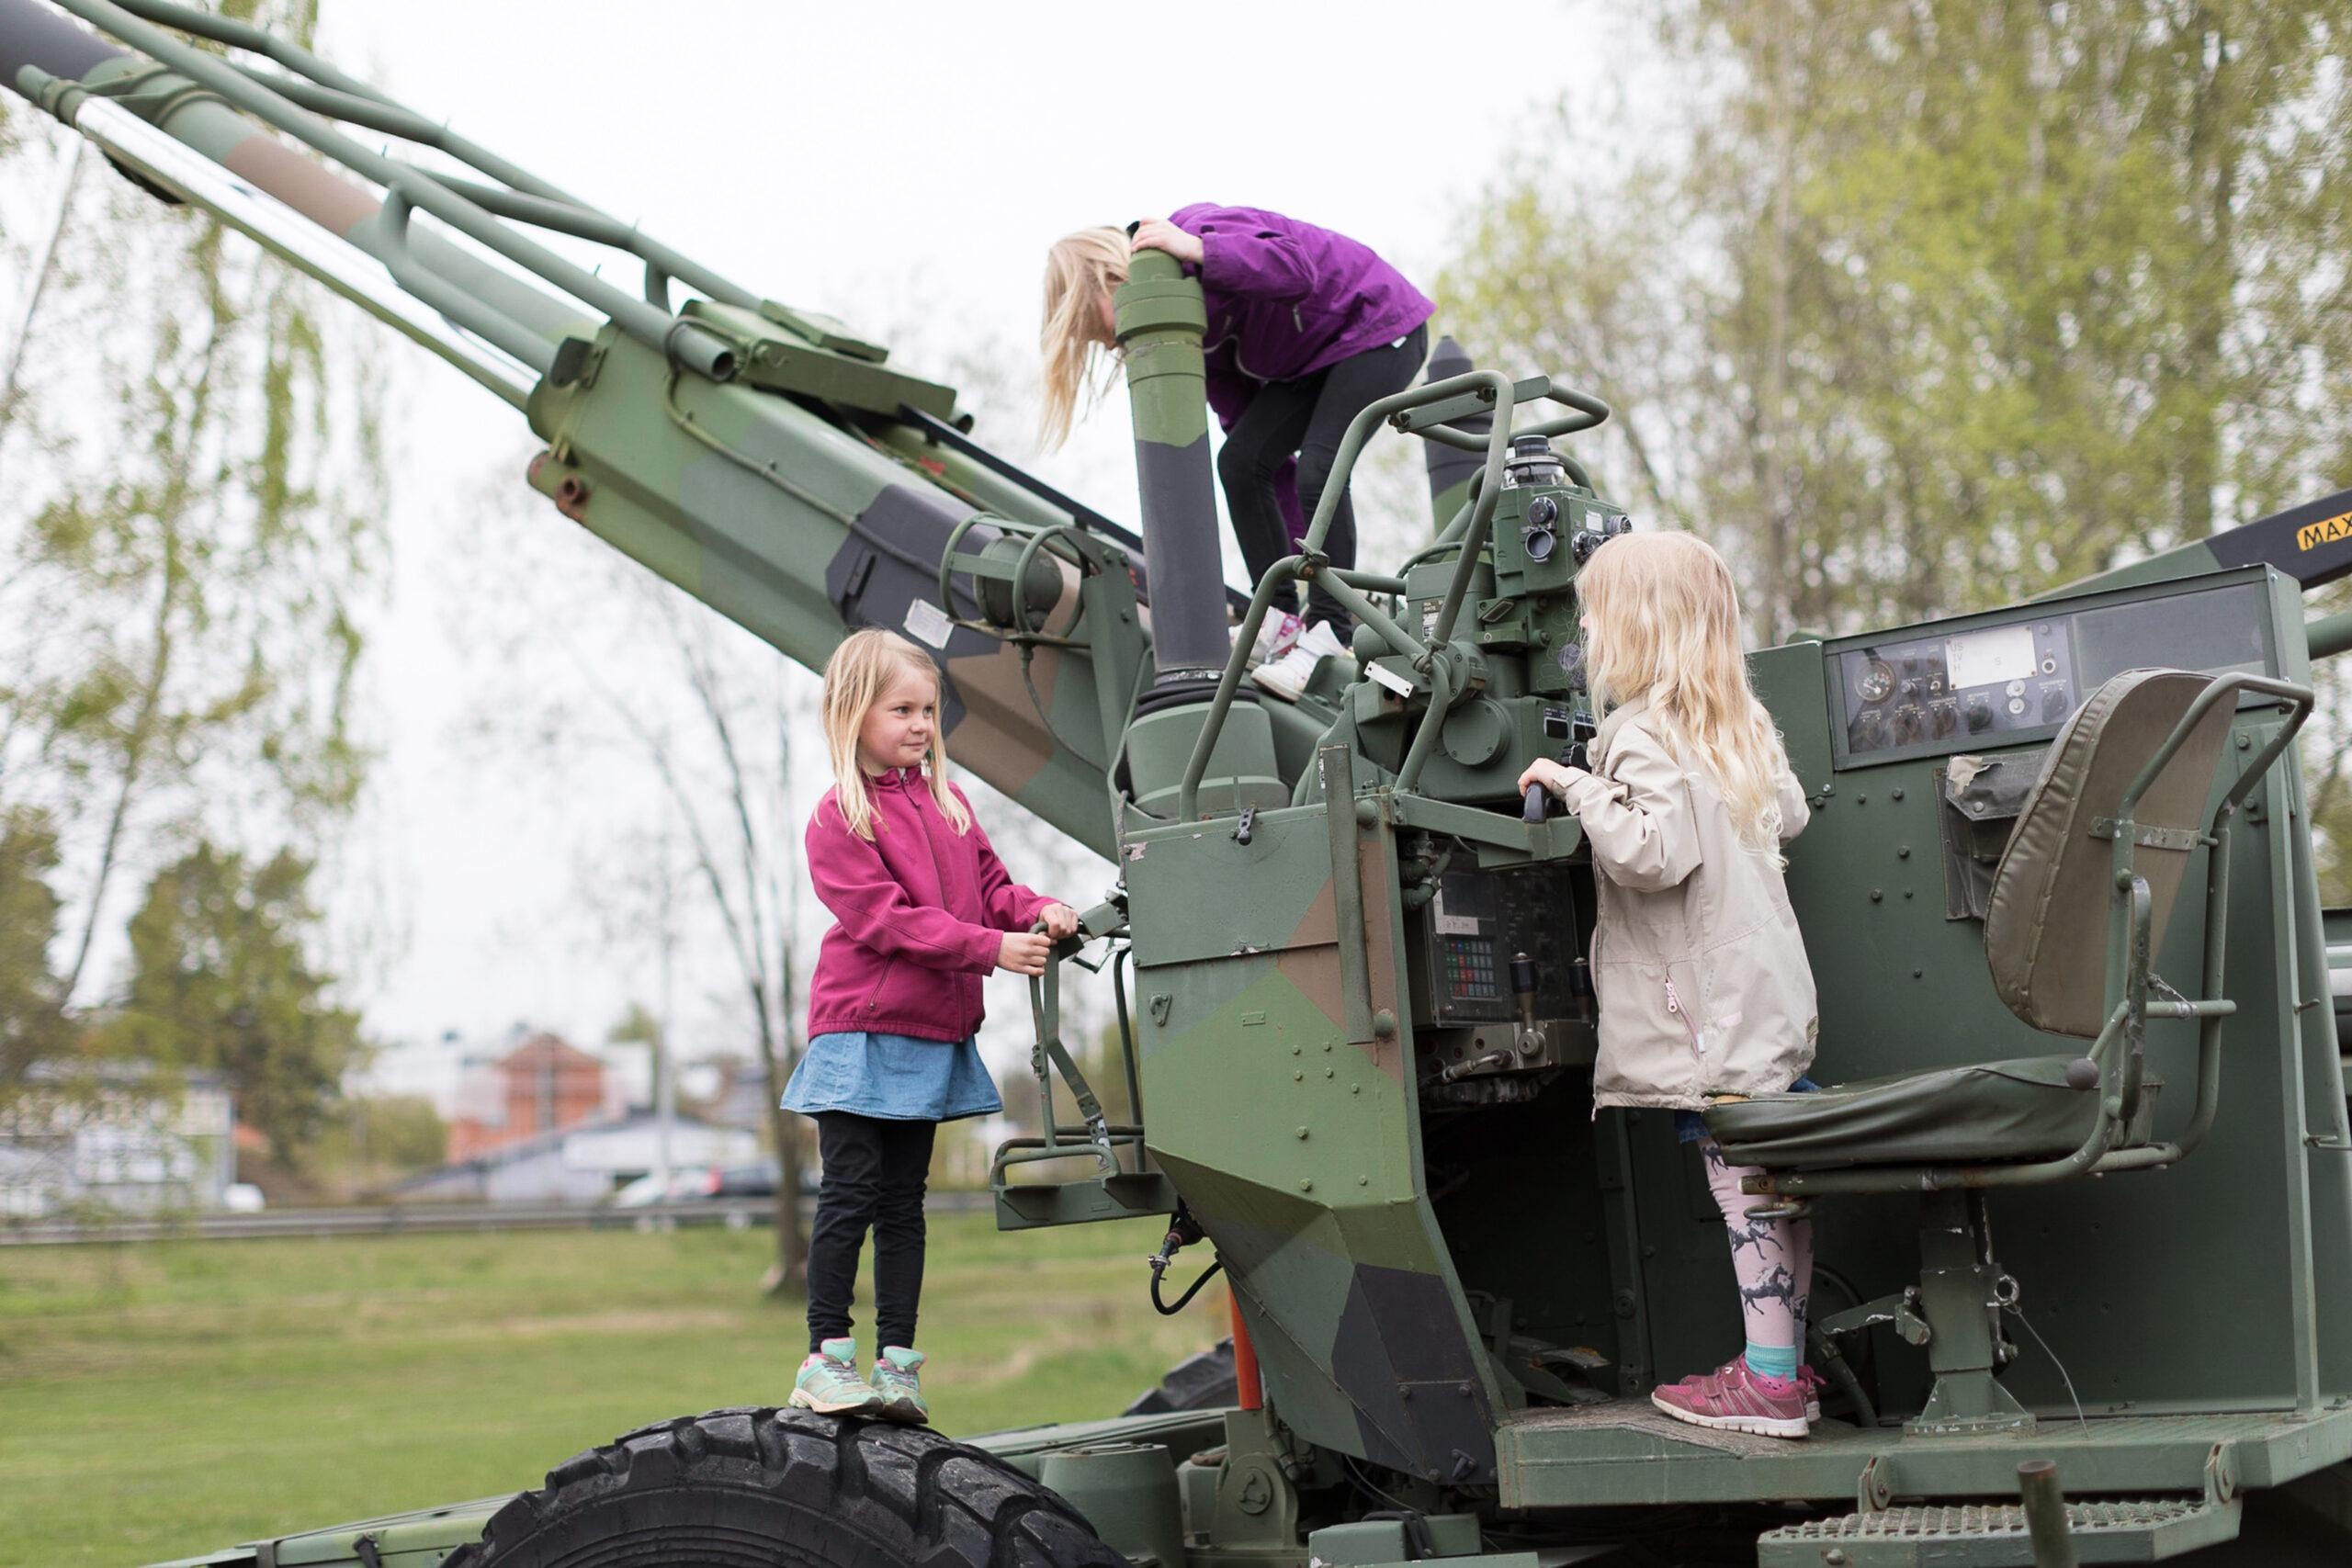 militärfordon-museum-karlstad-brigadmuseum-värmland-lek-upplevelsemuseum-barn